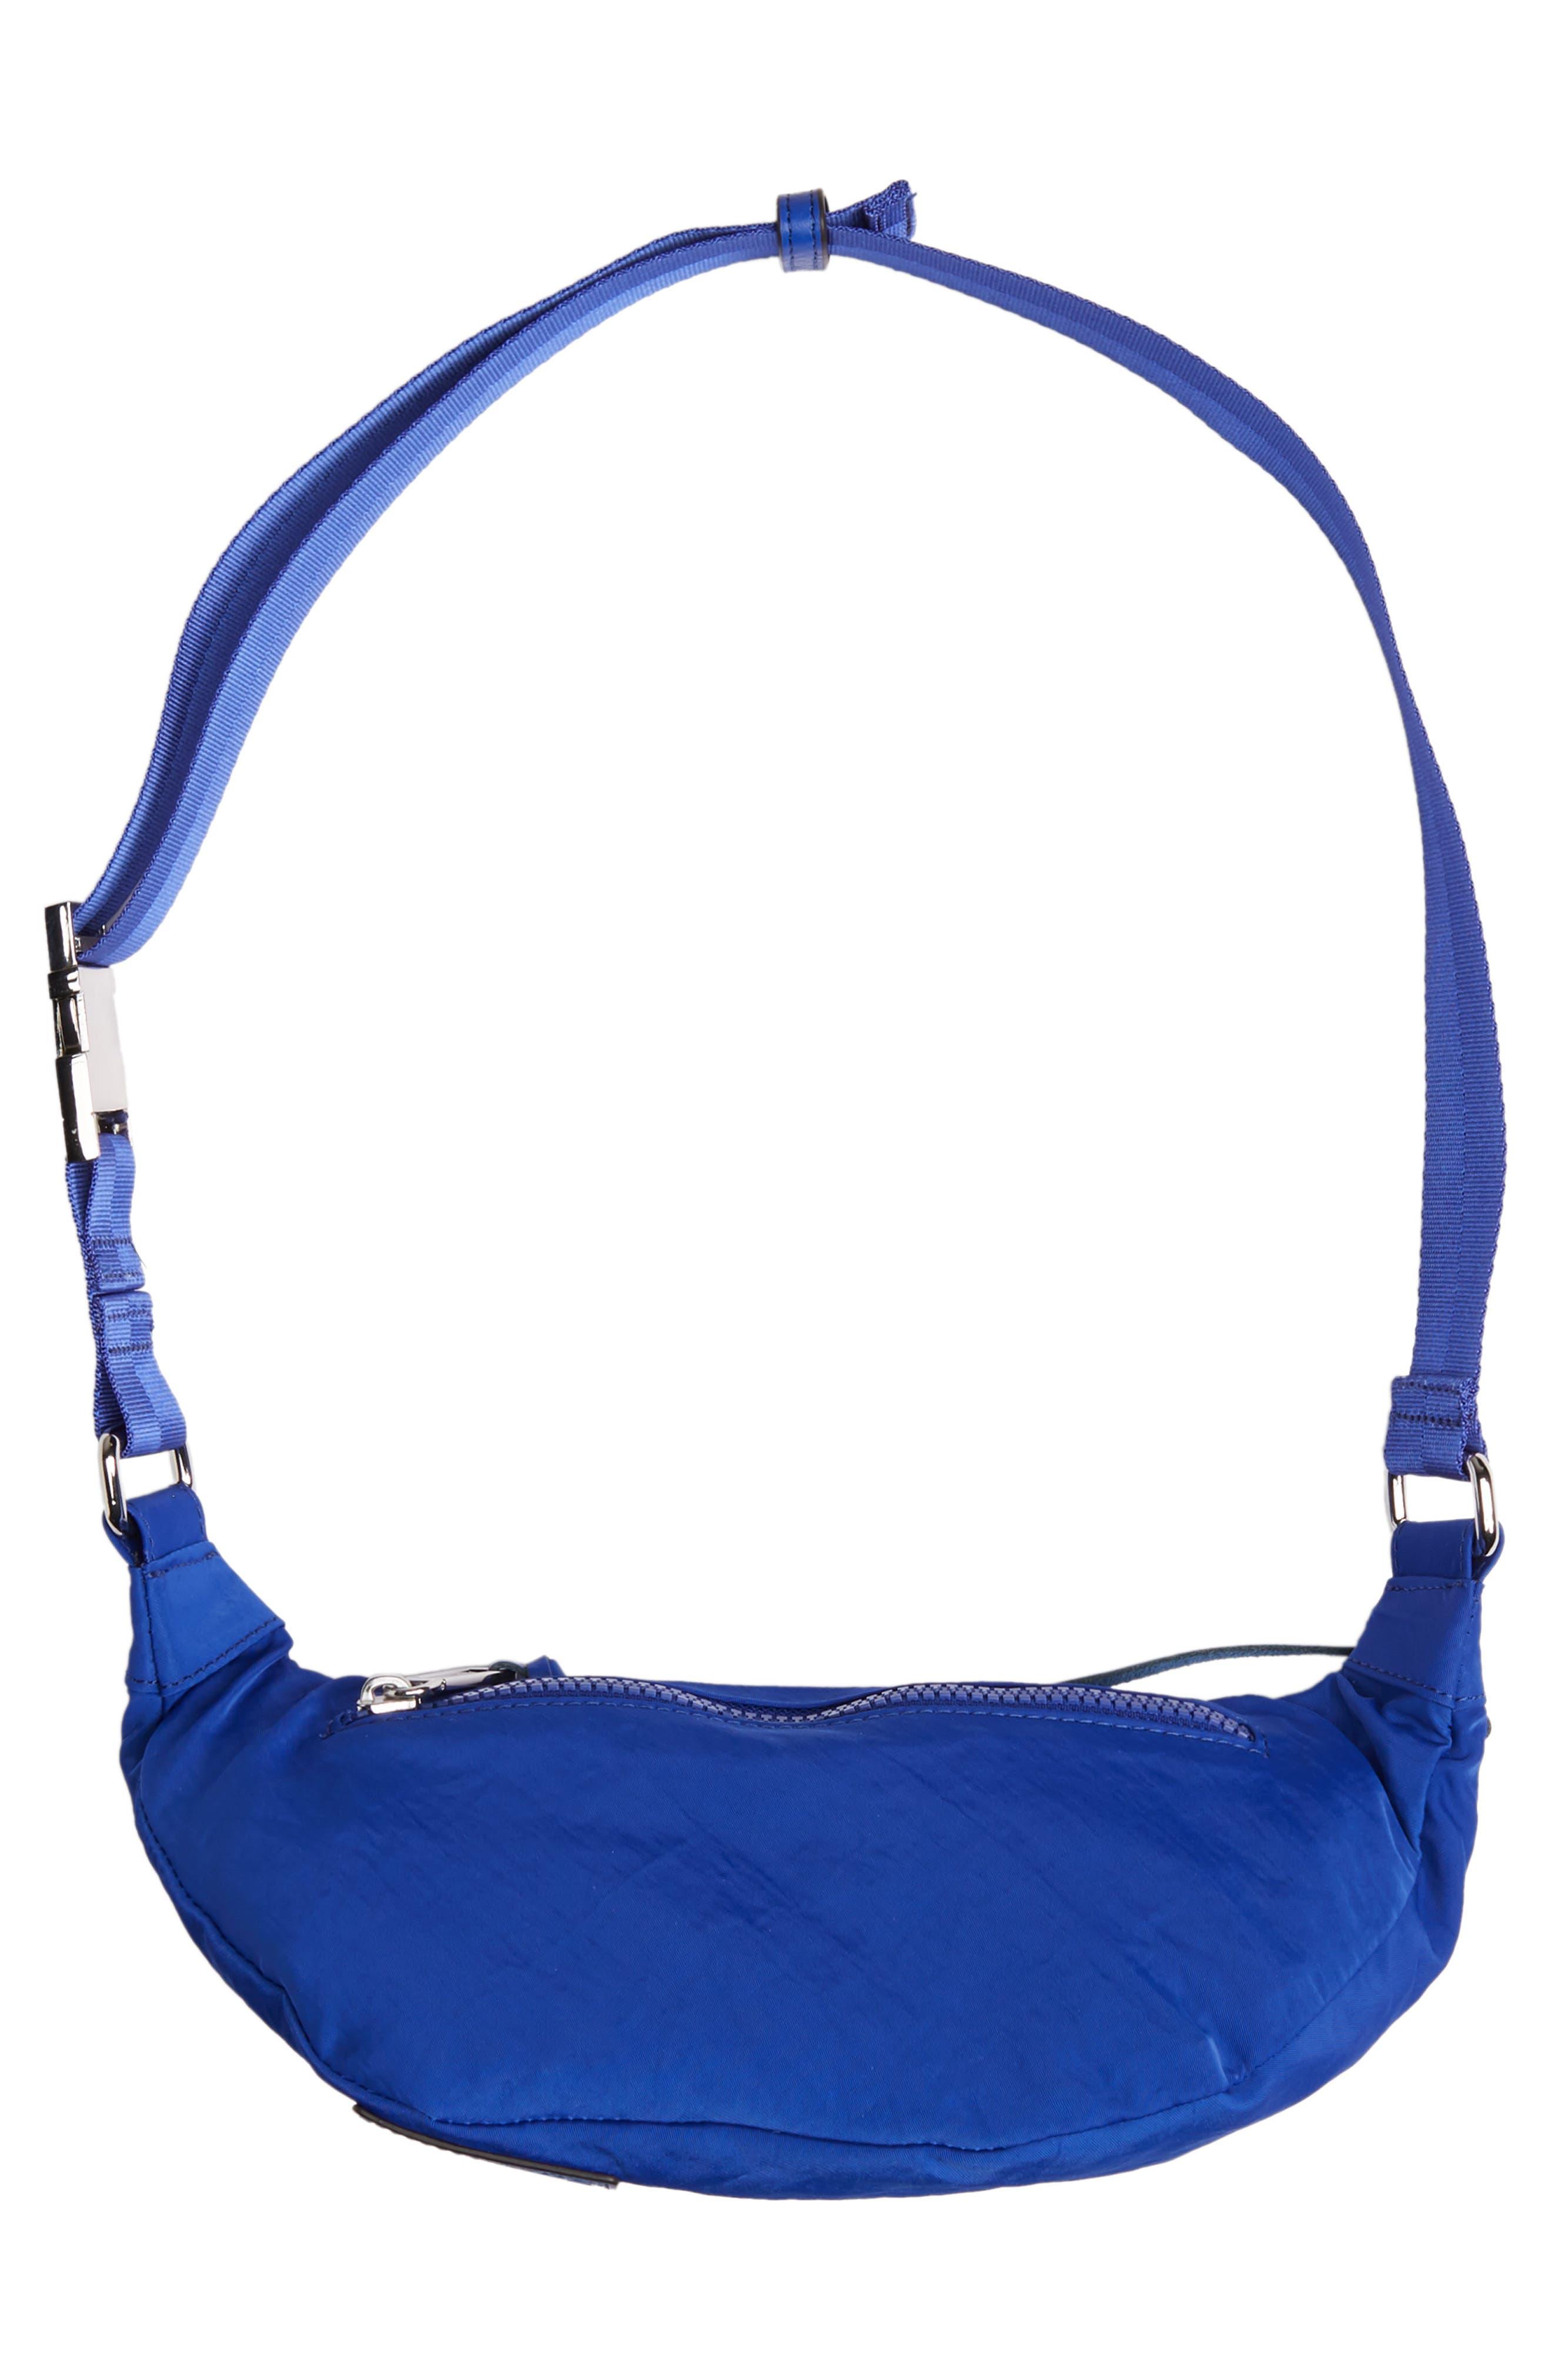 REBECCA MINKOFF, Nylon Belt Bag, Alternate thumbnail 8, color, BRIGHT BLUE